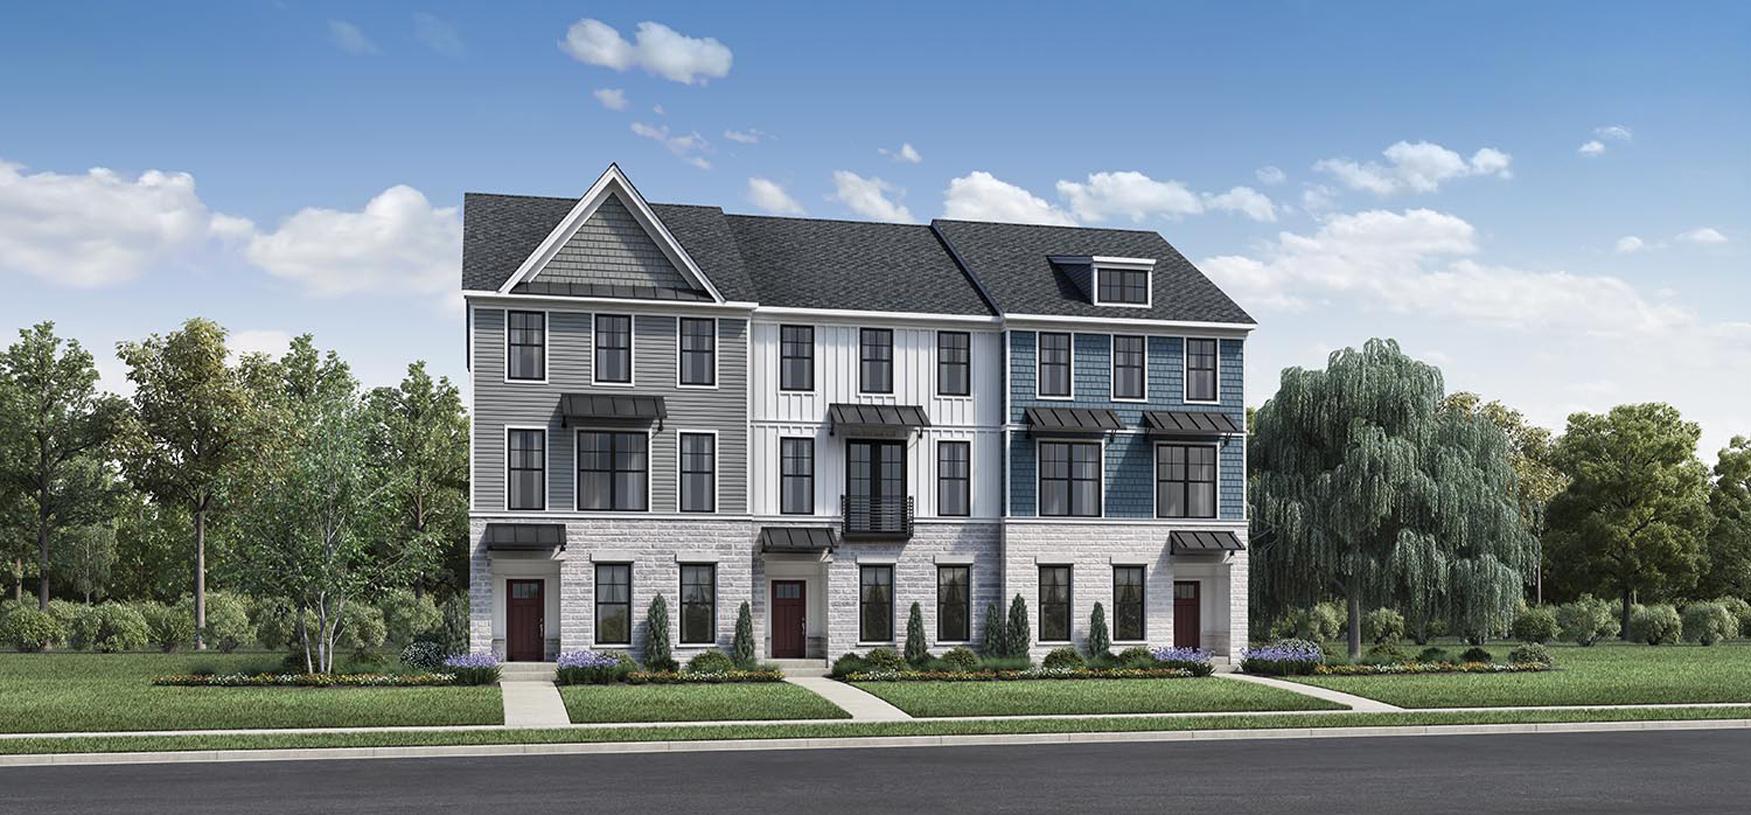 Fulton - Fulton Home Sites 125-130 and 141-151